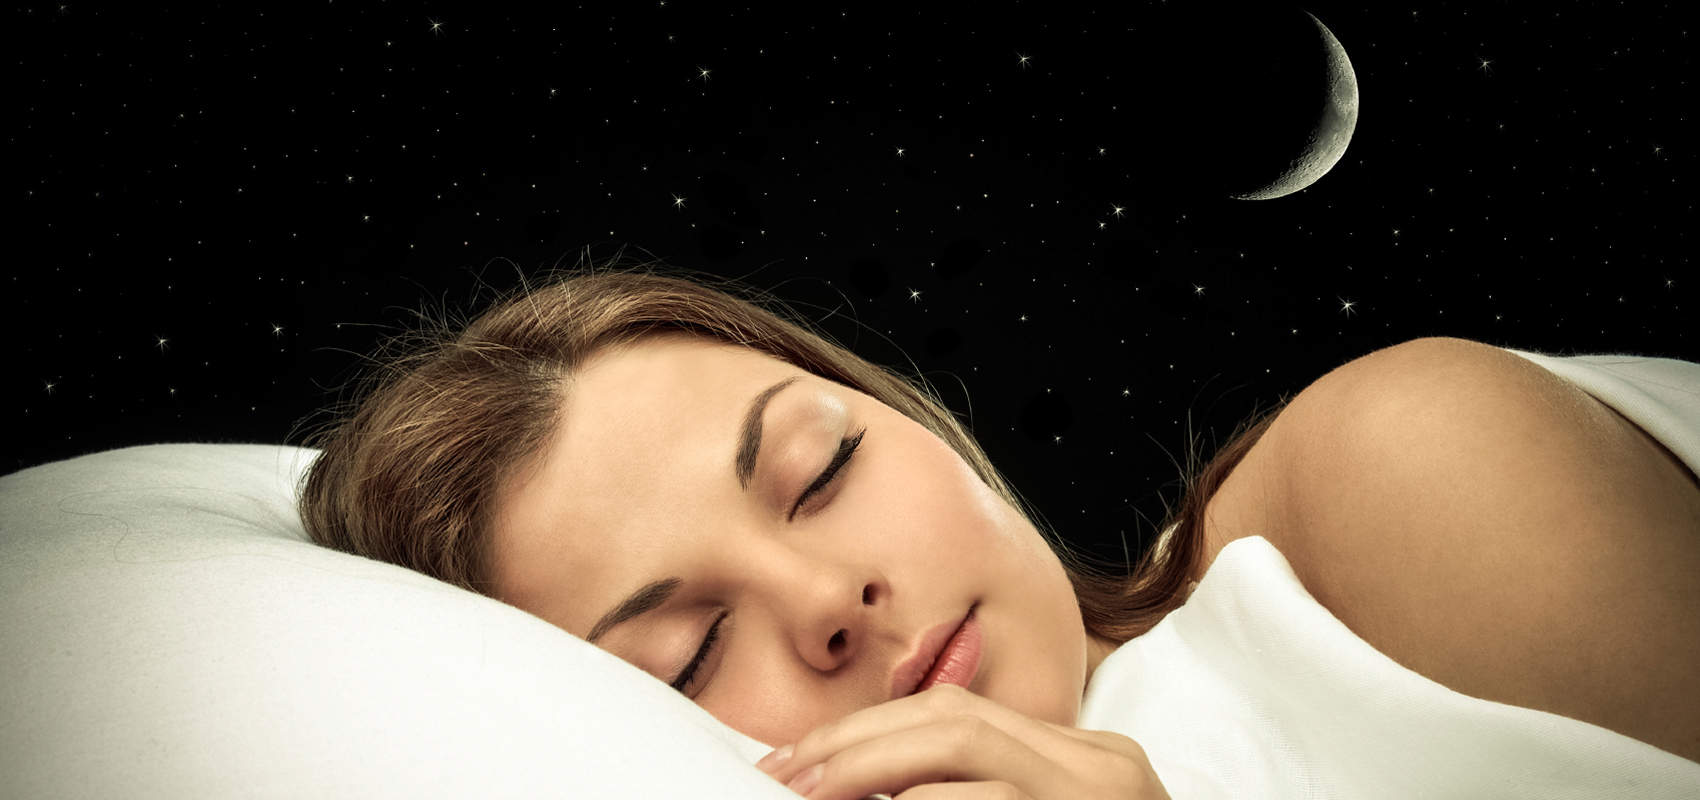 Девушка спит крепким сном